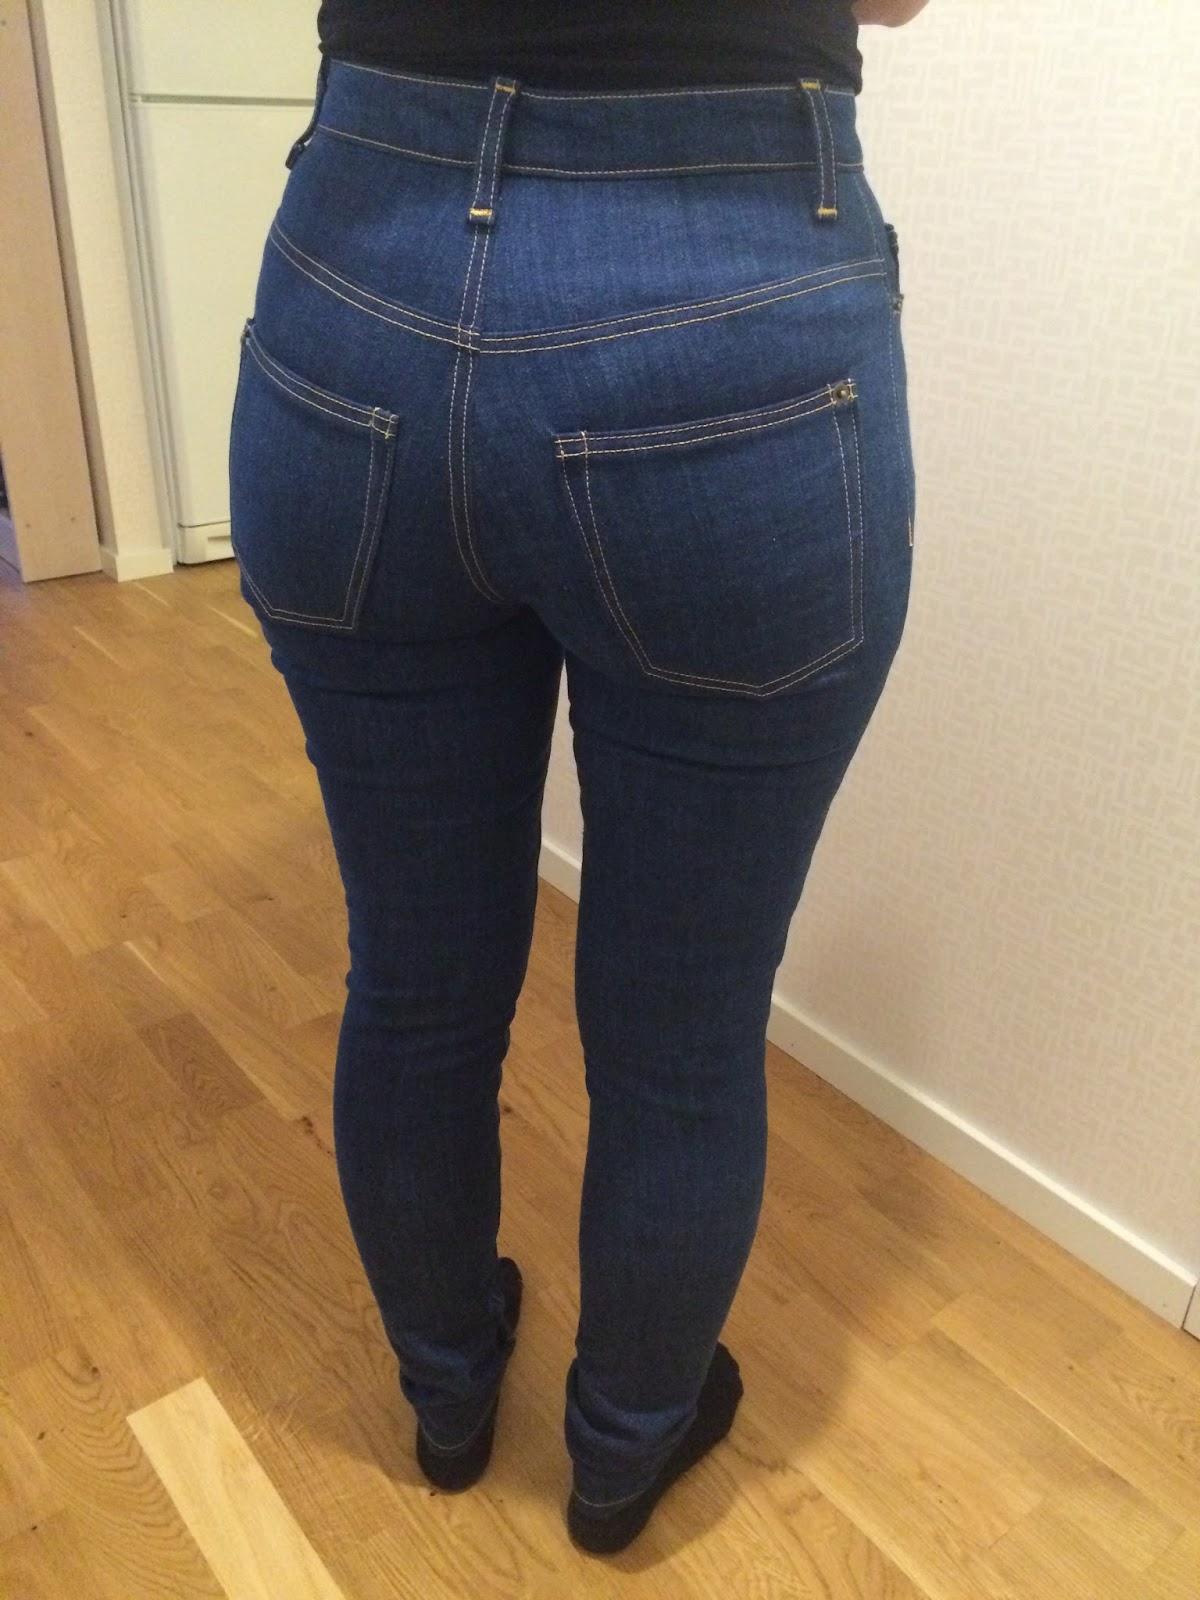 jeans töjer sig